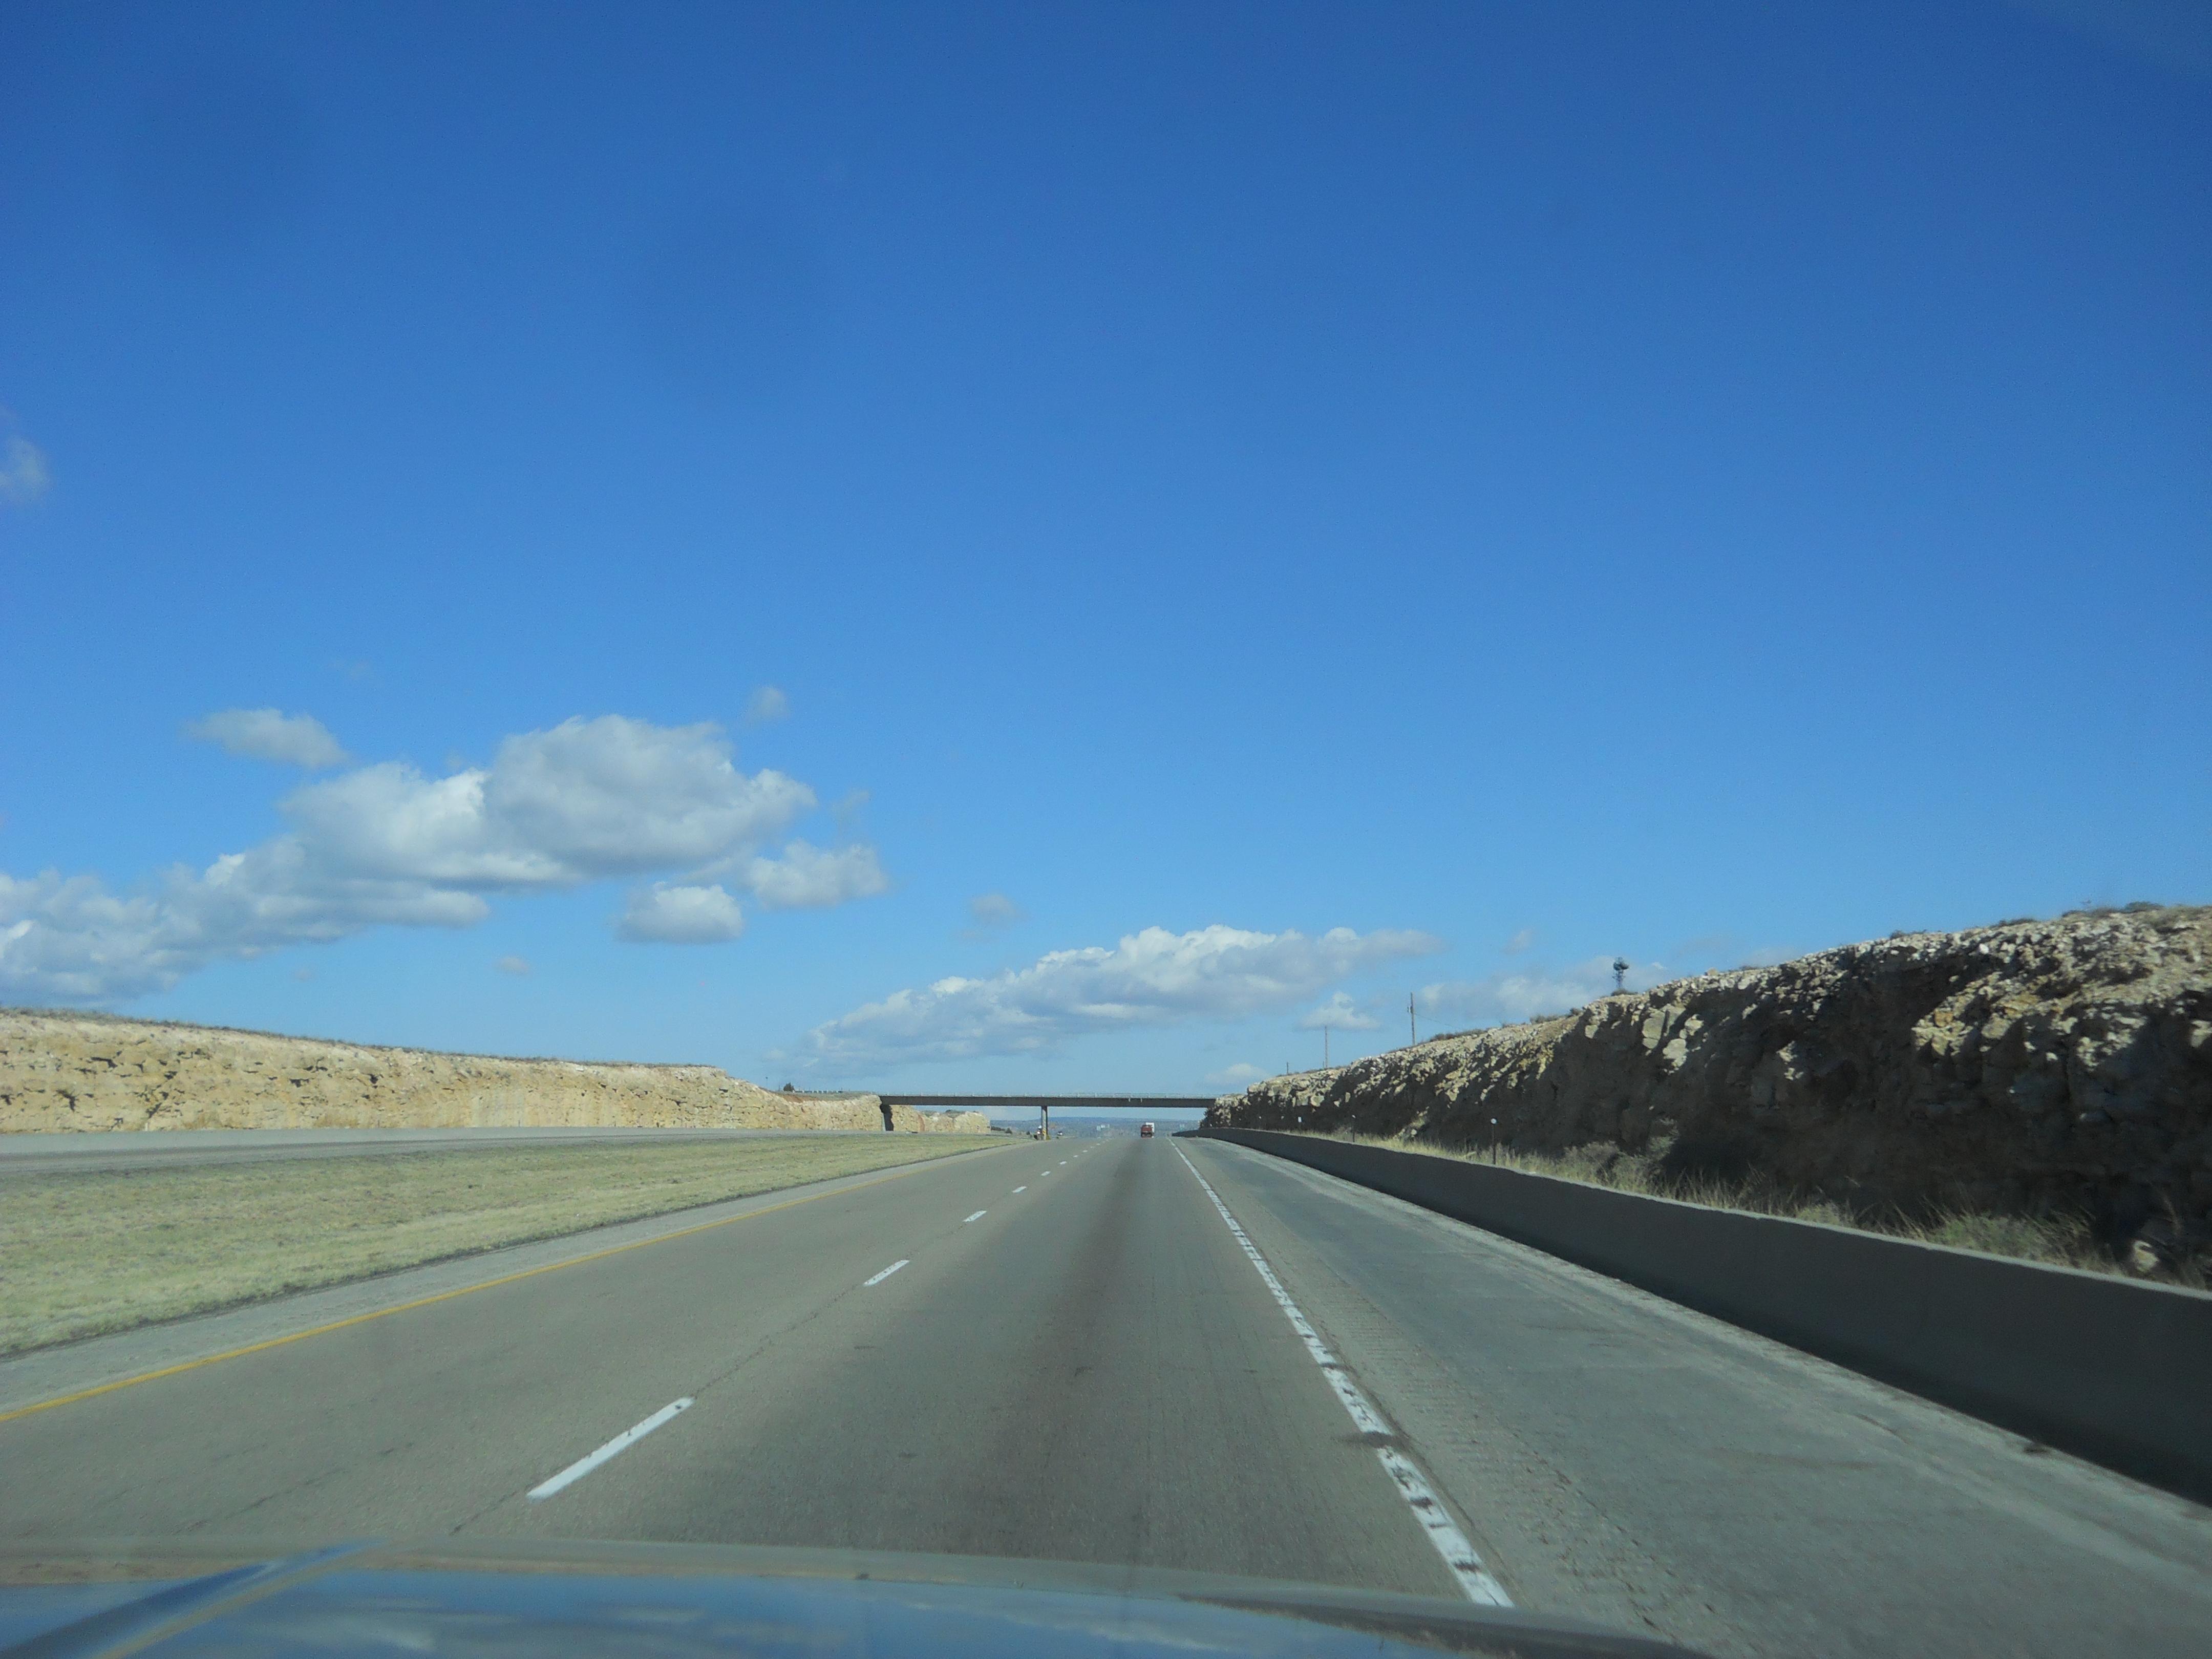 Roadtrip: Georgia to Arizona, 9th Day